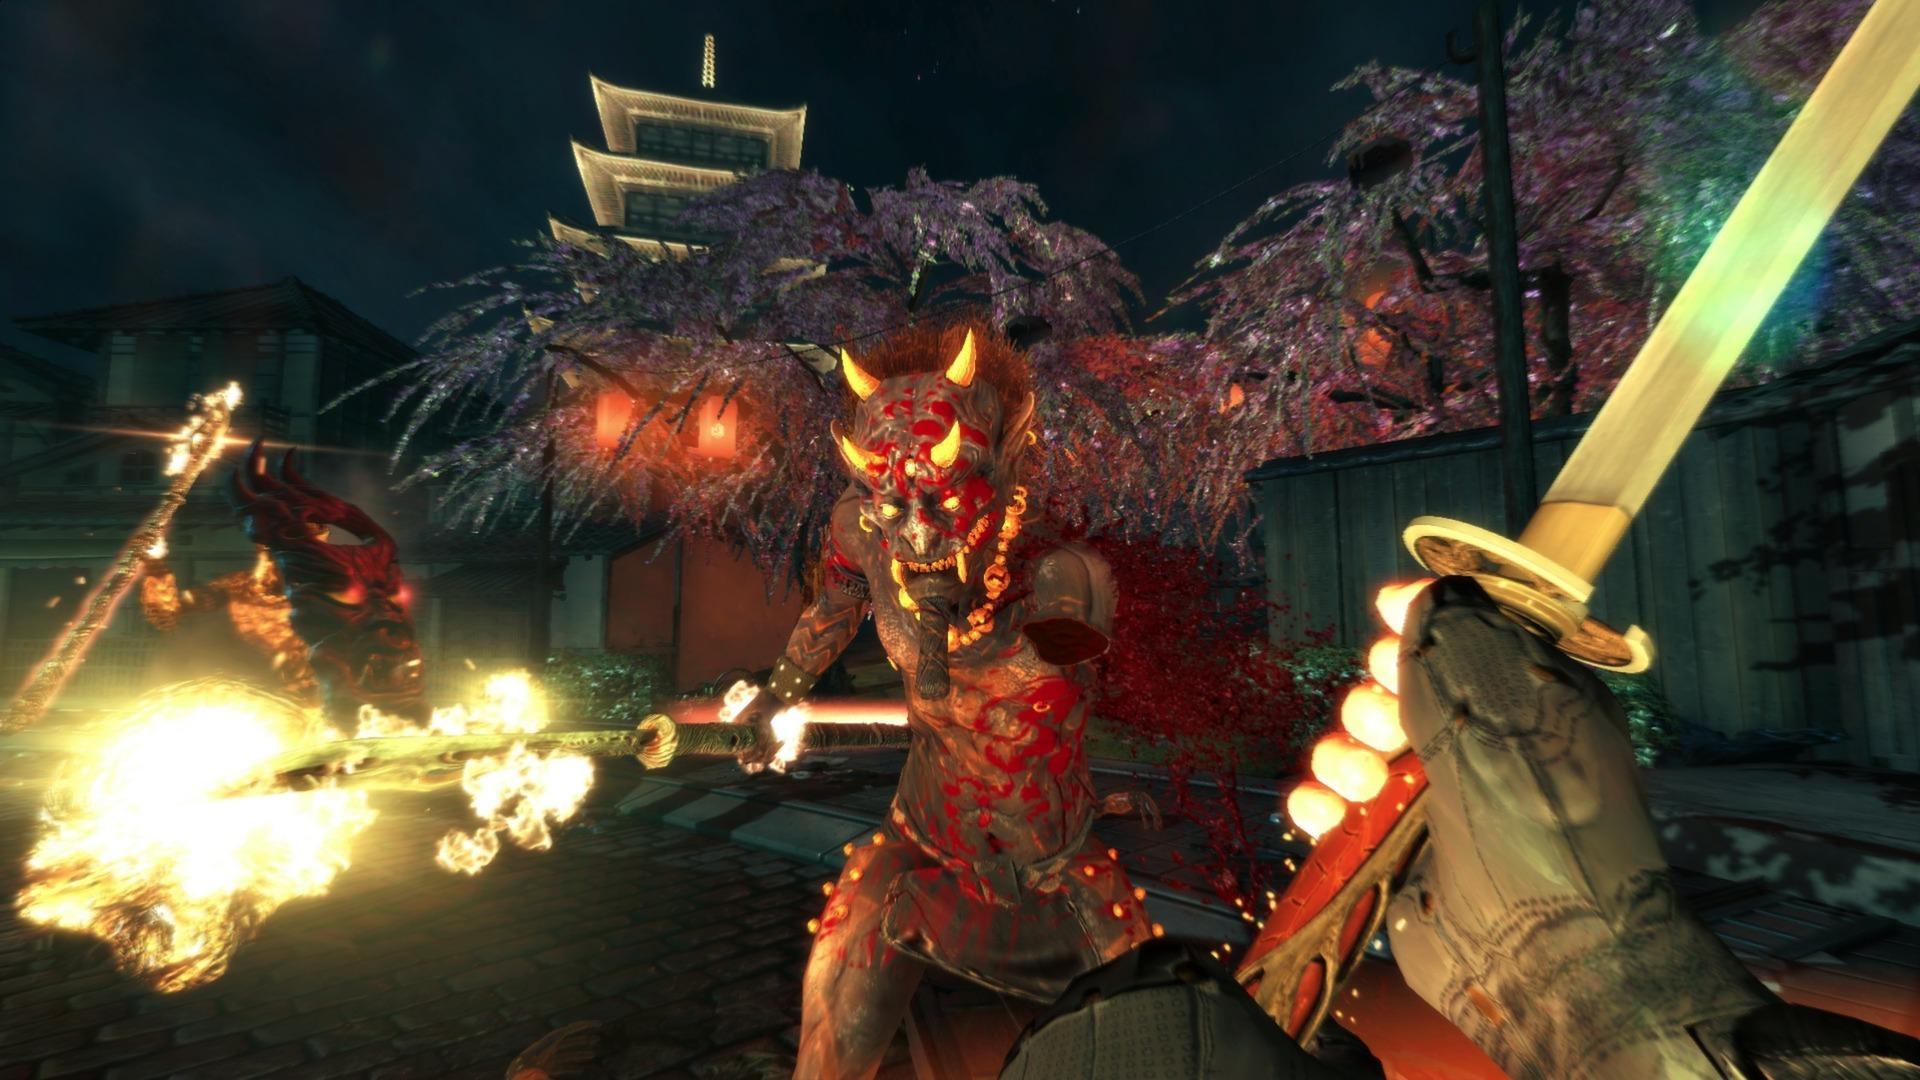 shadow-warrior-2013-pc-screenshot-4